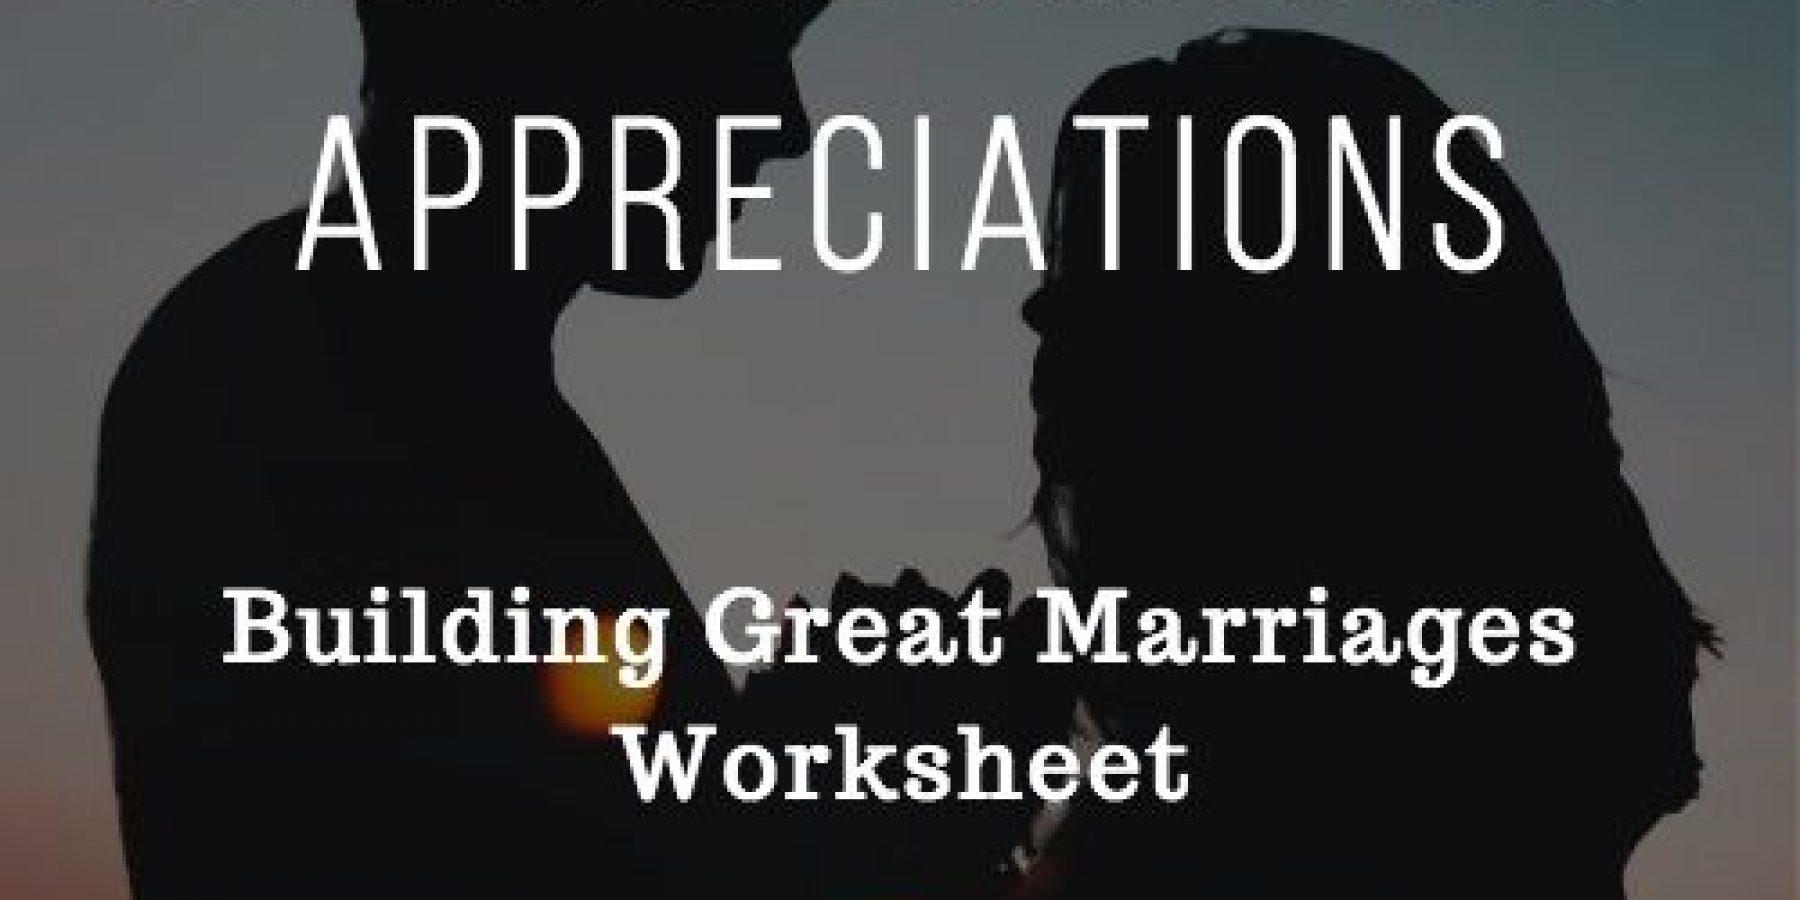 WKS_AmazingApprecations_500x500